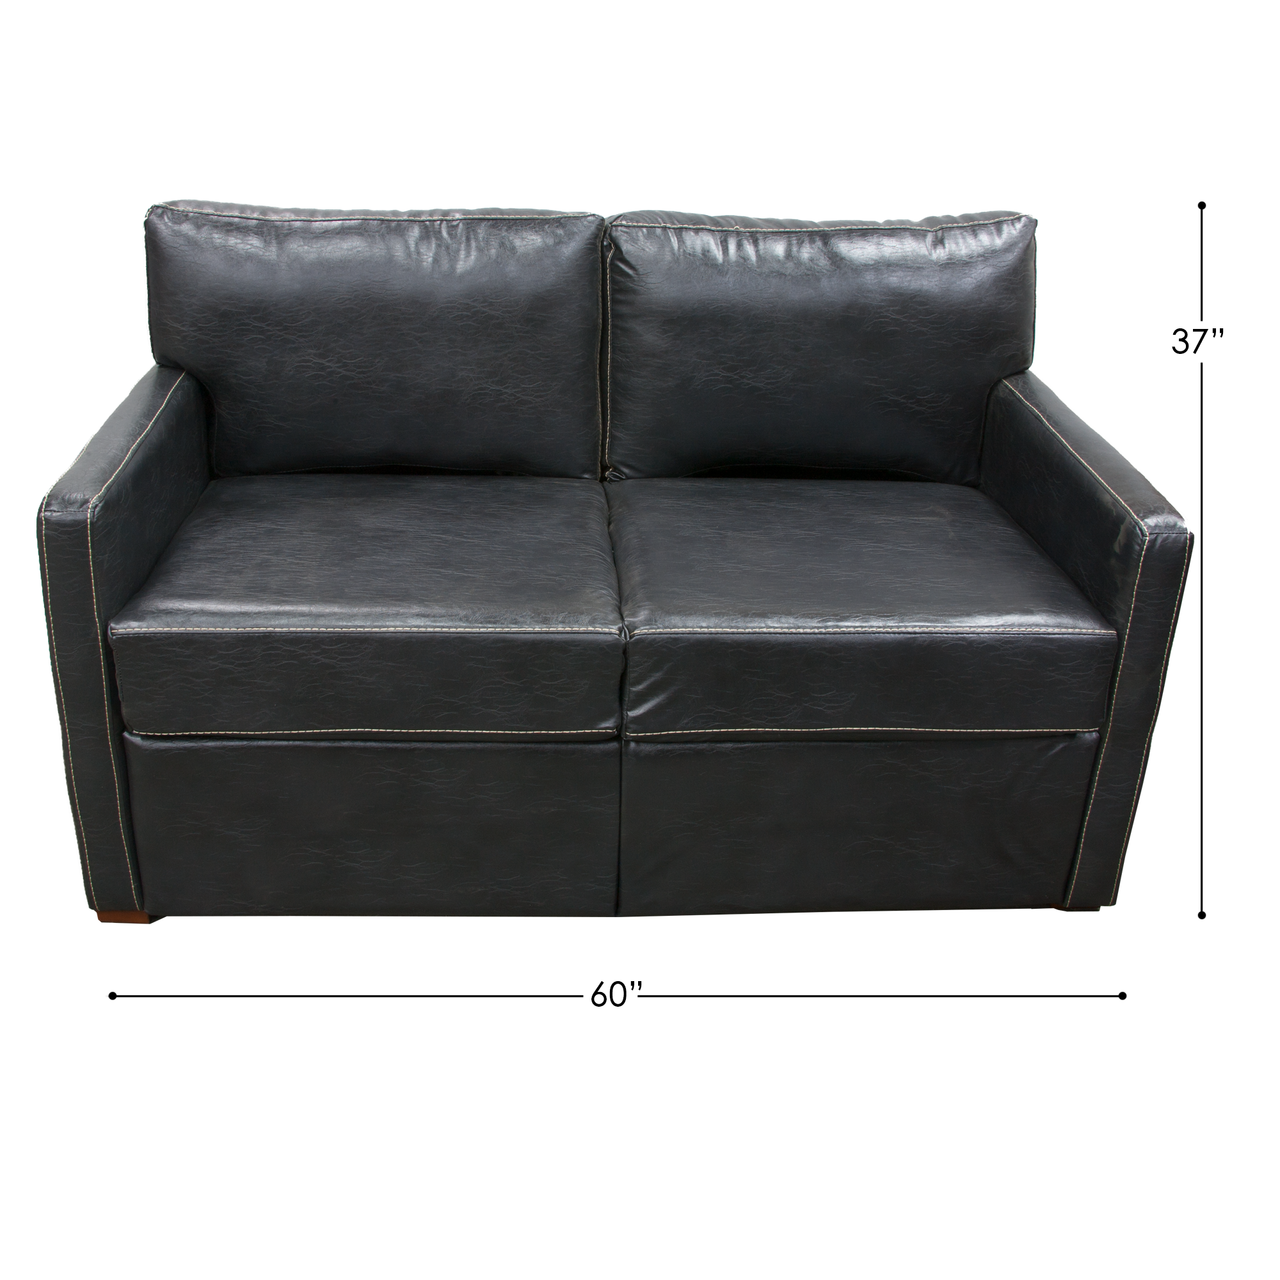 RV Black Trifold Sleeper Sofa   RV Parts Nation   Black ...